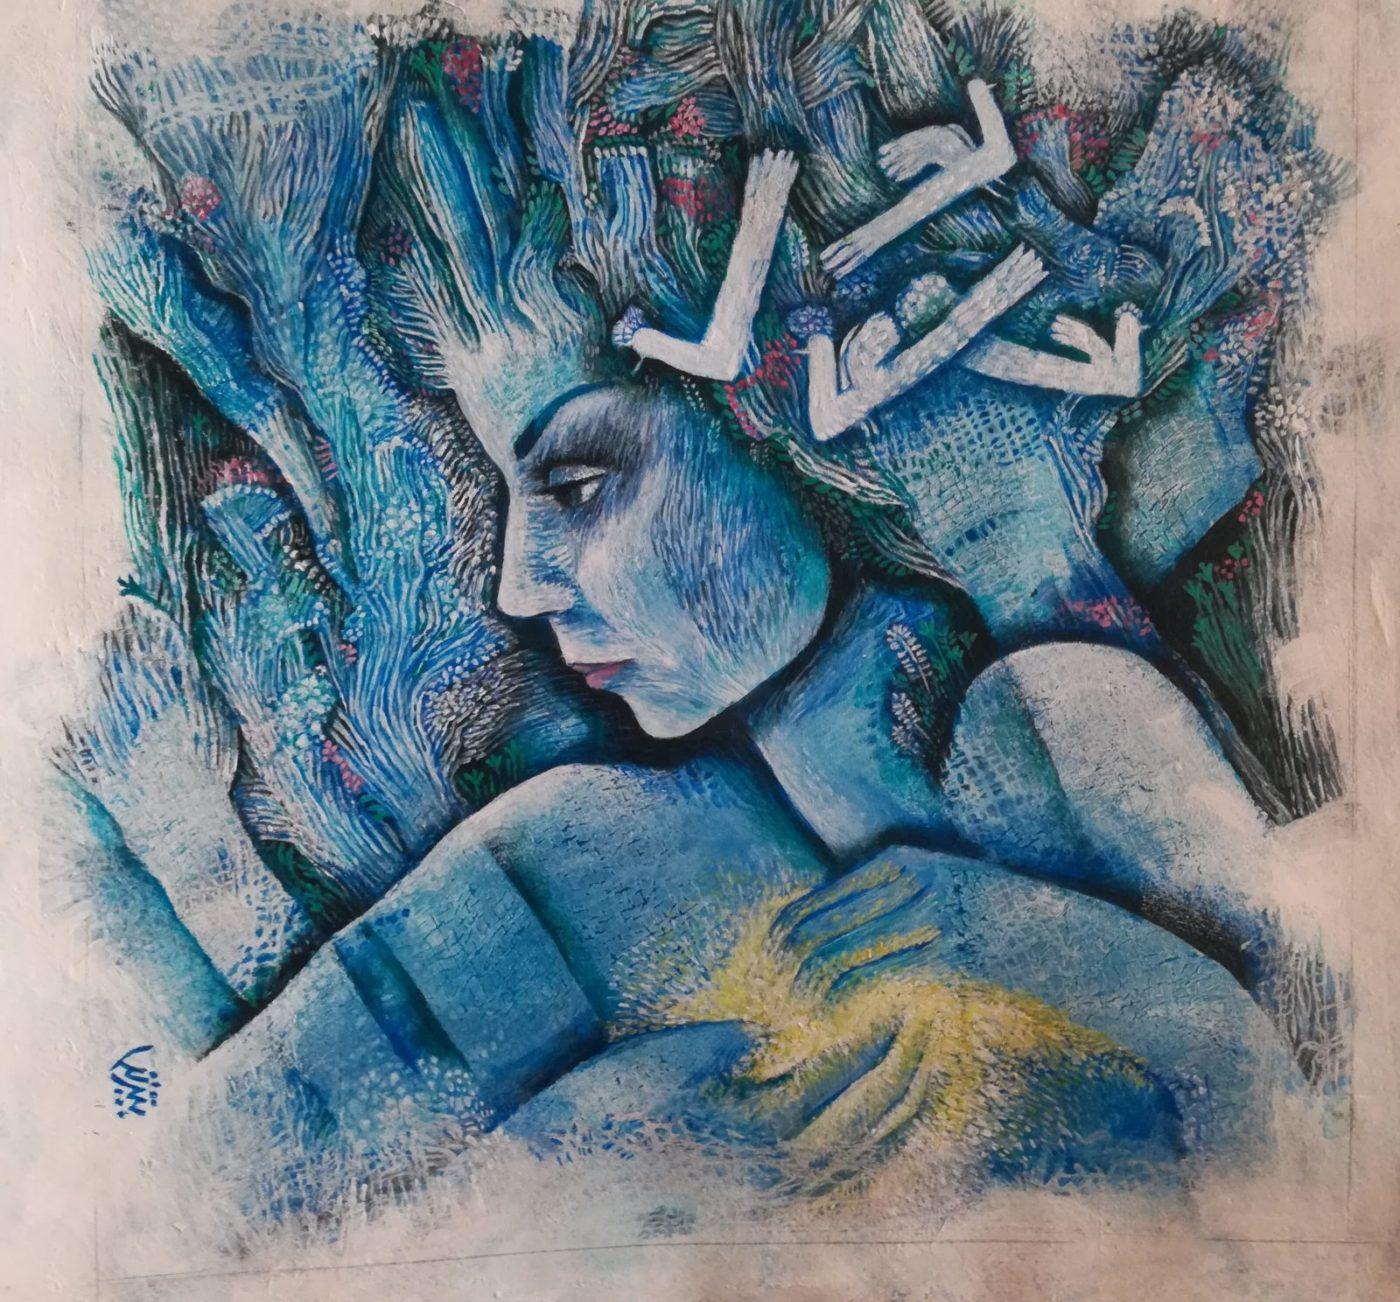 رویا بیژنی-۱۳۹۶